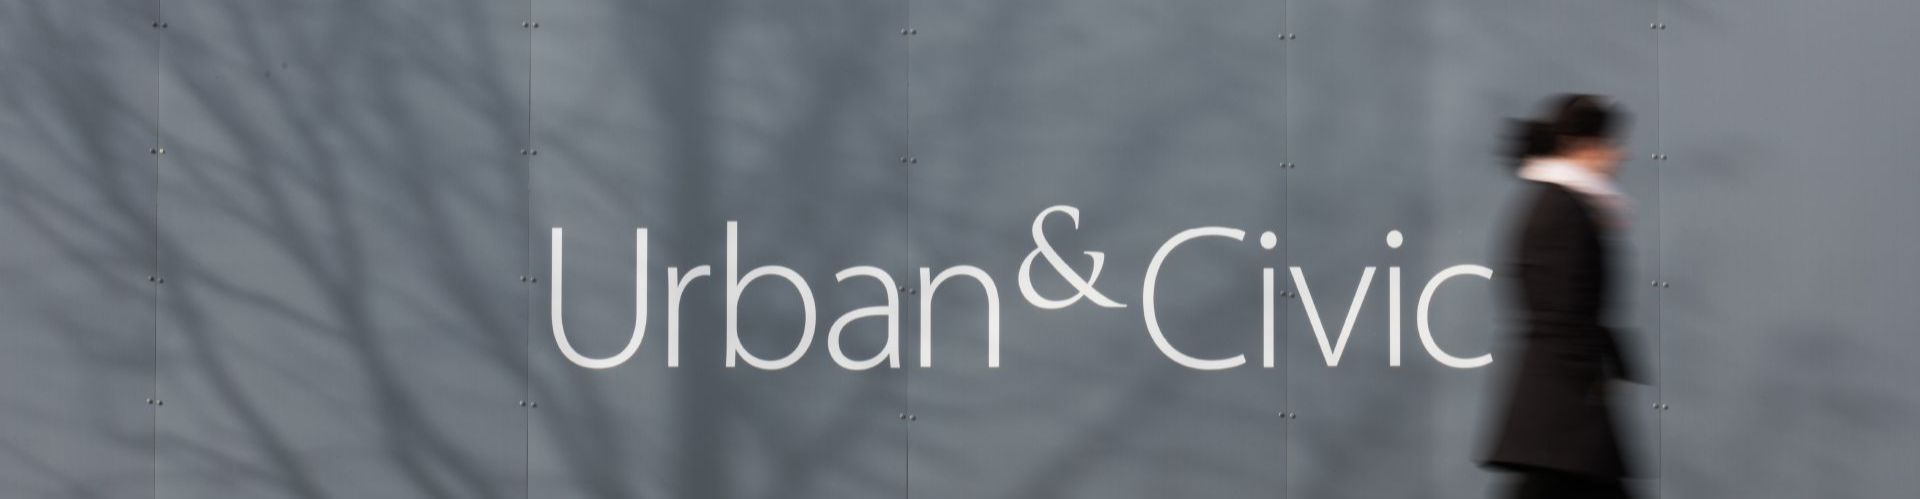 30.04.19_Urban&Civic plc tranfers to the premium listing segment.jpg